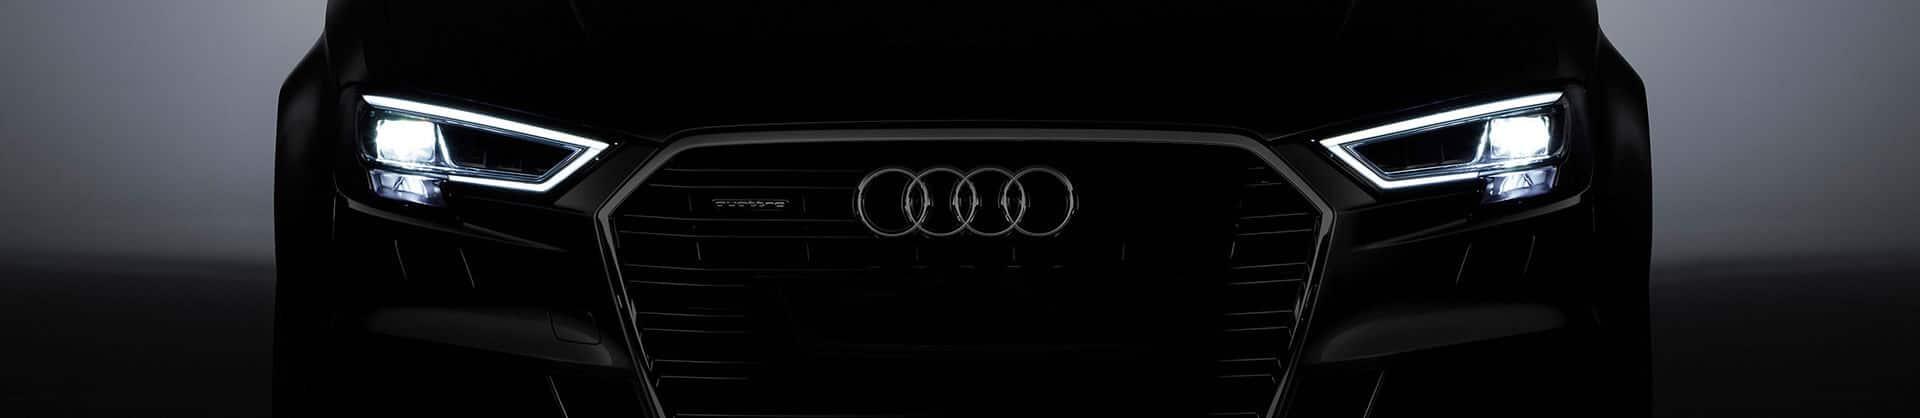 Kekurangan Audi Ae Tangguh